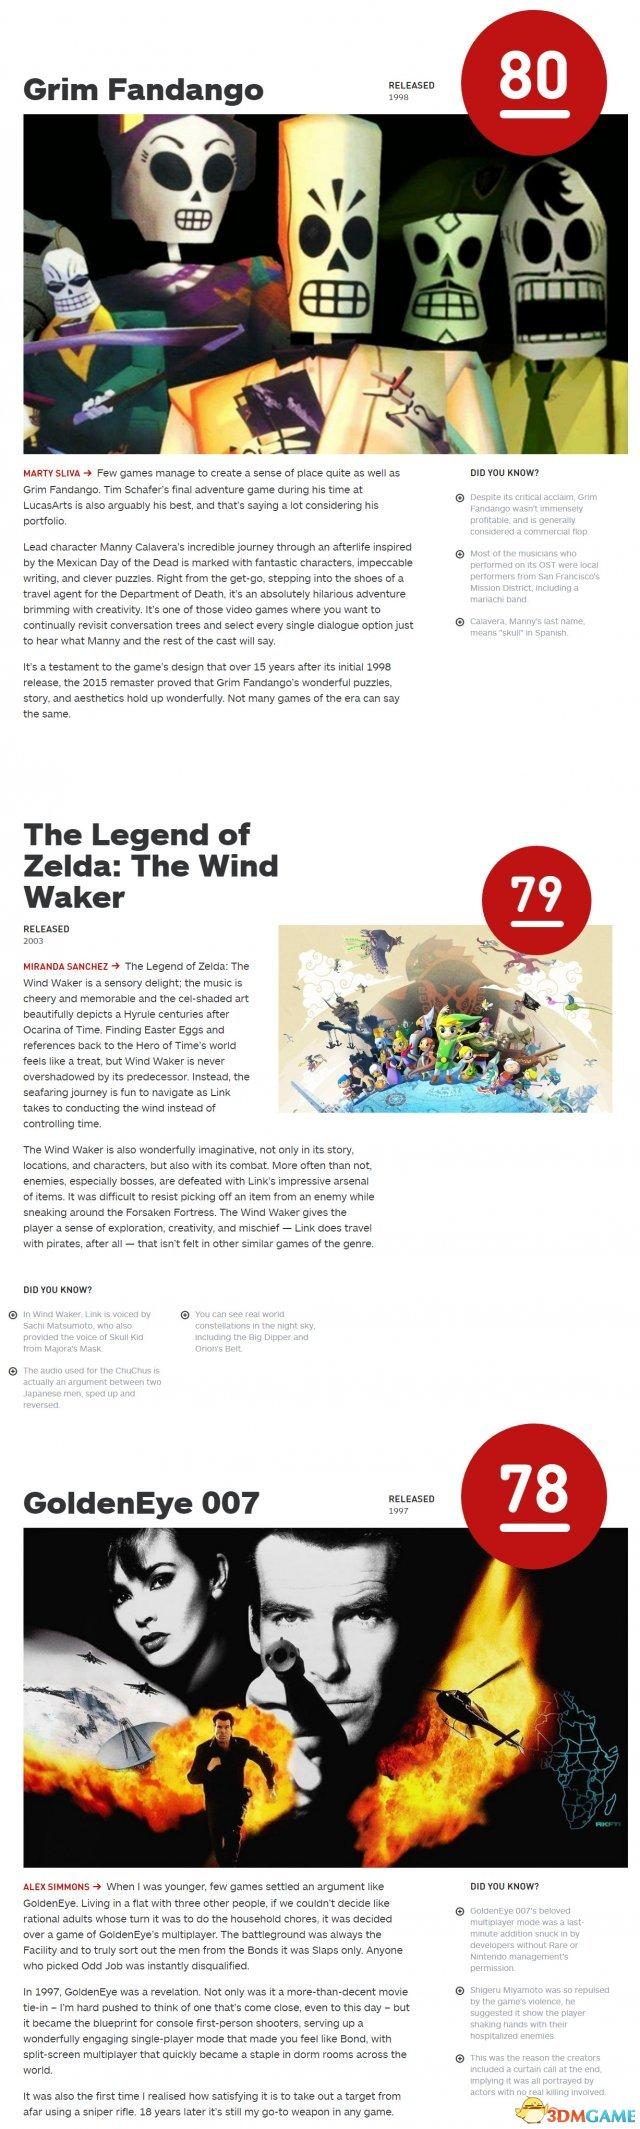 IGN评选TOP100游戏 《DOTA2》排名远超《LOL》